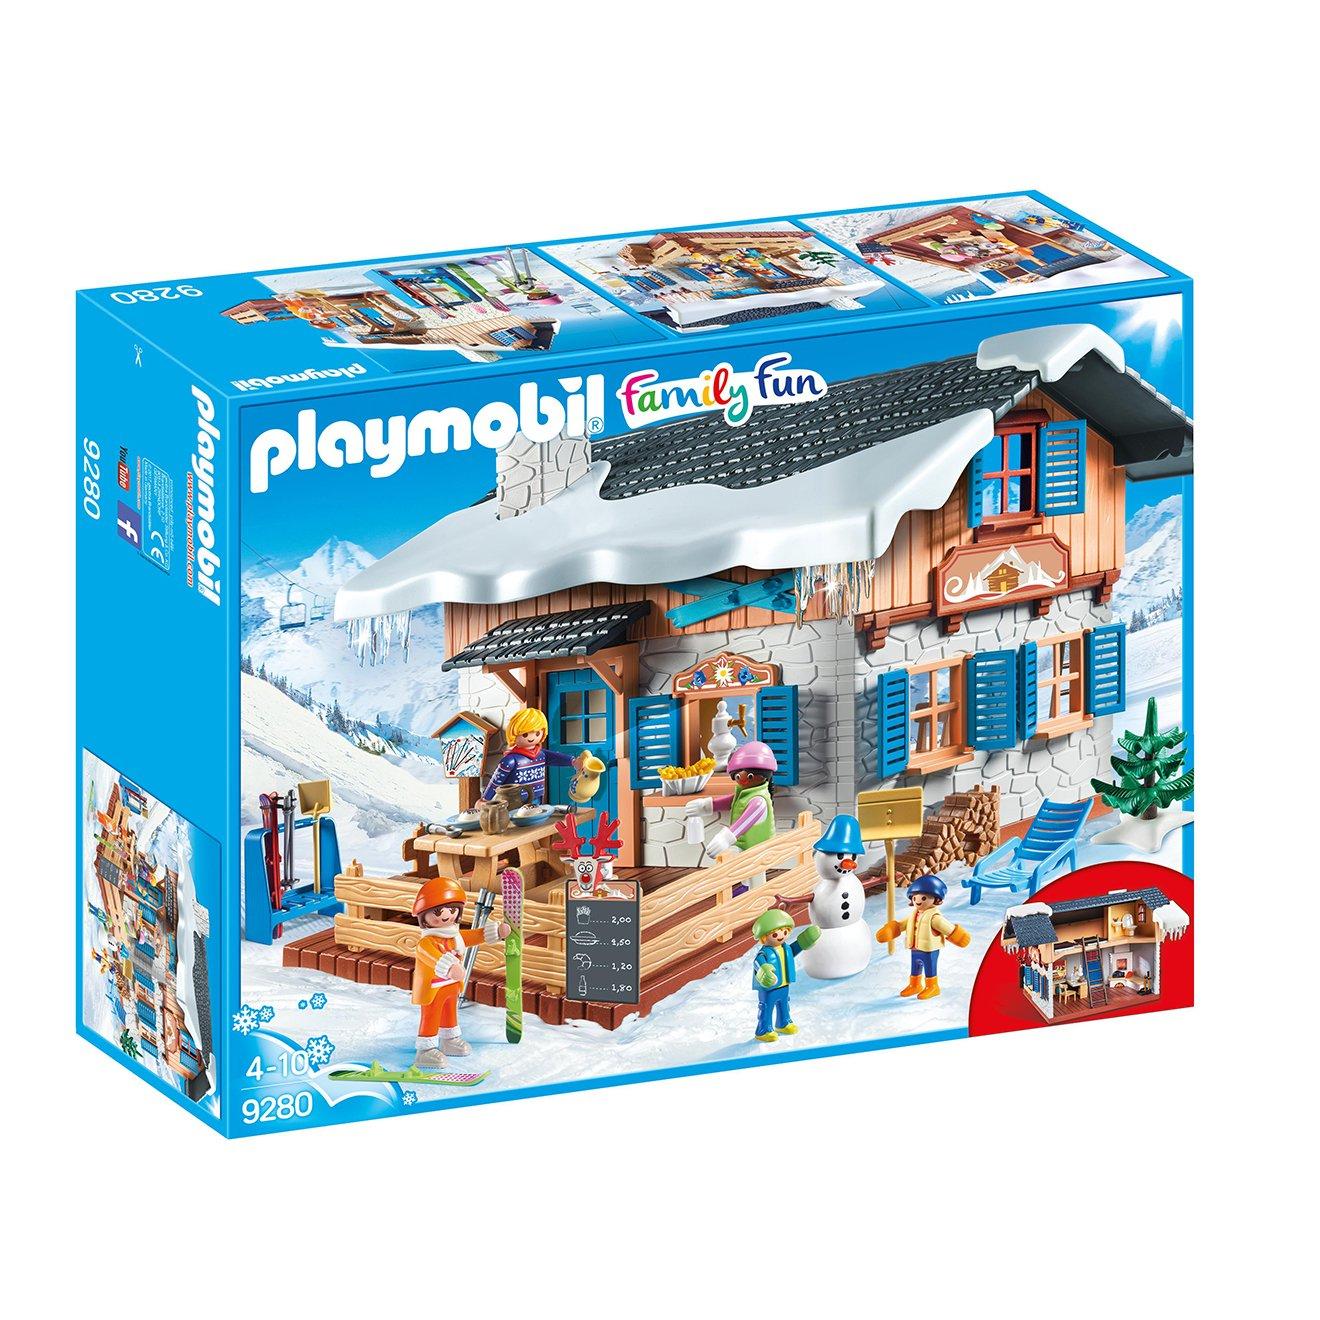 [Lokal Designer Outlet Berlin/Wustermark] Playmobil Skihütte 9280 (auch in Ochtrup & Neumünster)